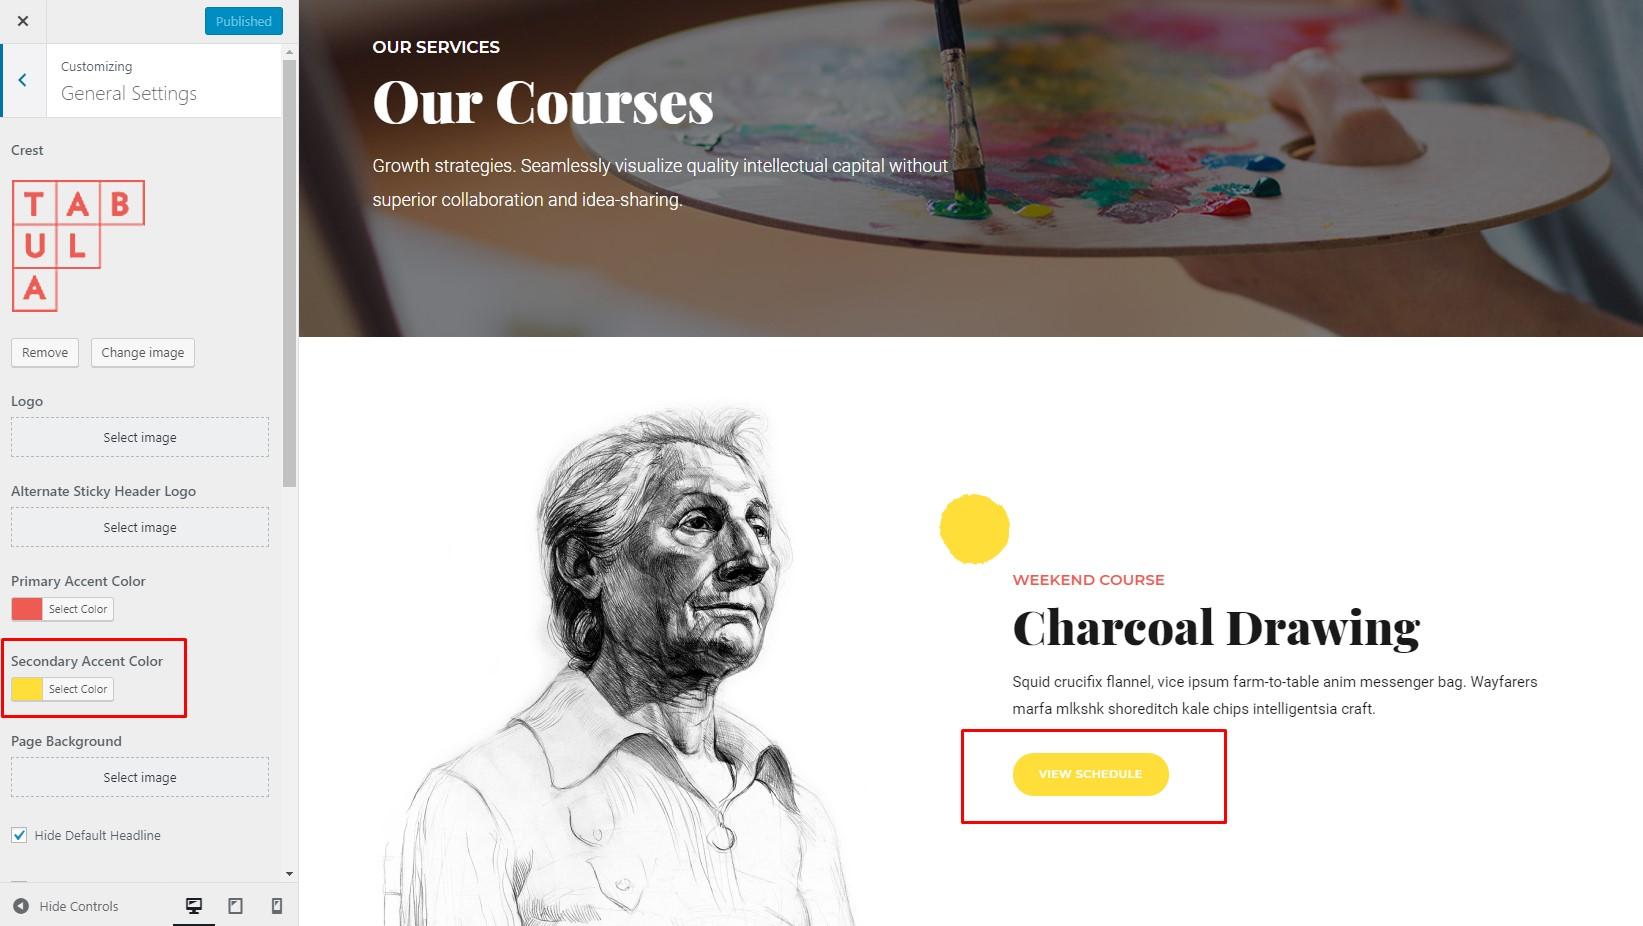 https://documentation.bold-themes.com/tabula/wp-content/uploads/sites/43/2019/06/alt-color.jpg